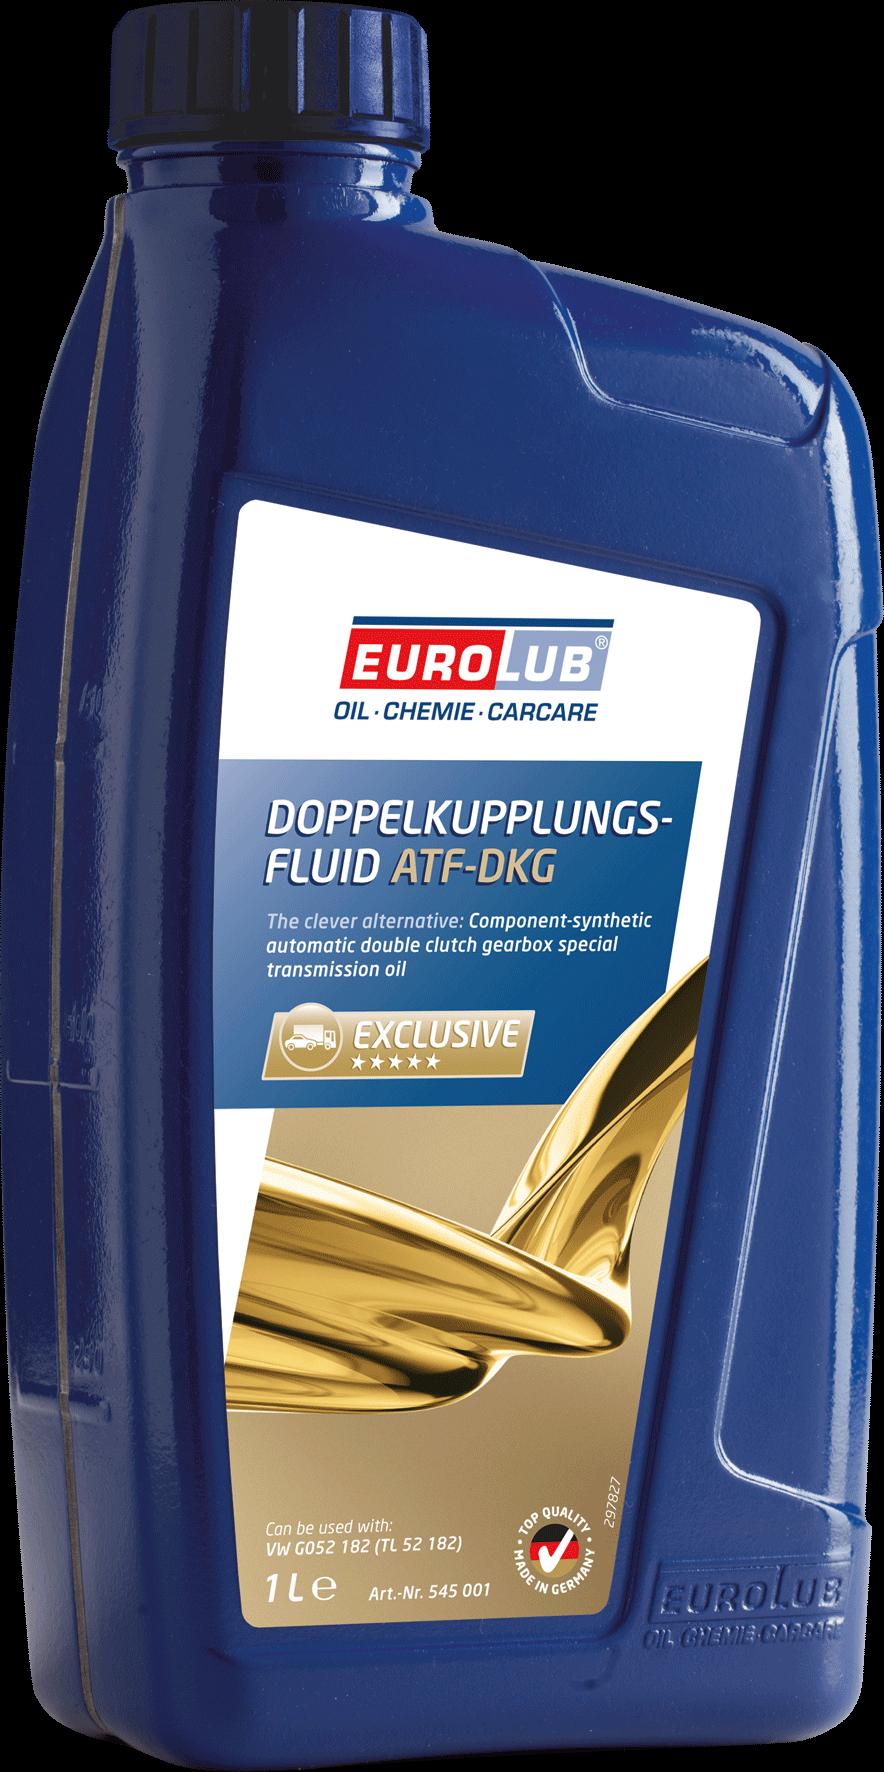 EUROLUB DOPPELKUPPLUNGS – FLUID (DKG) (для систем з подвійним зчепленням), 1л